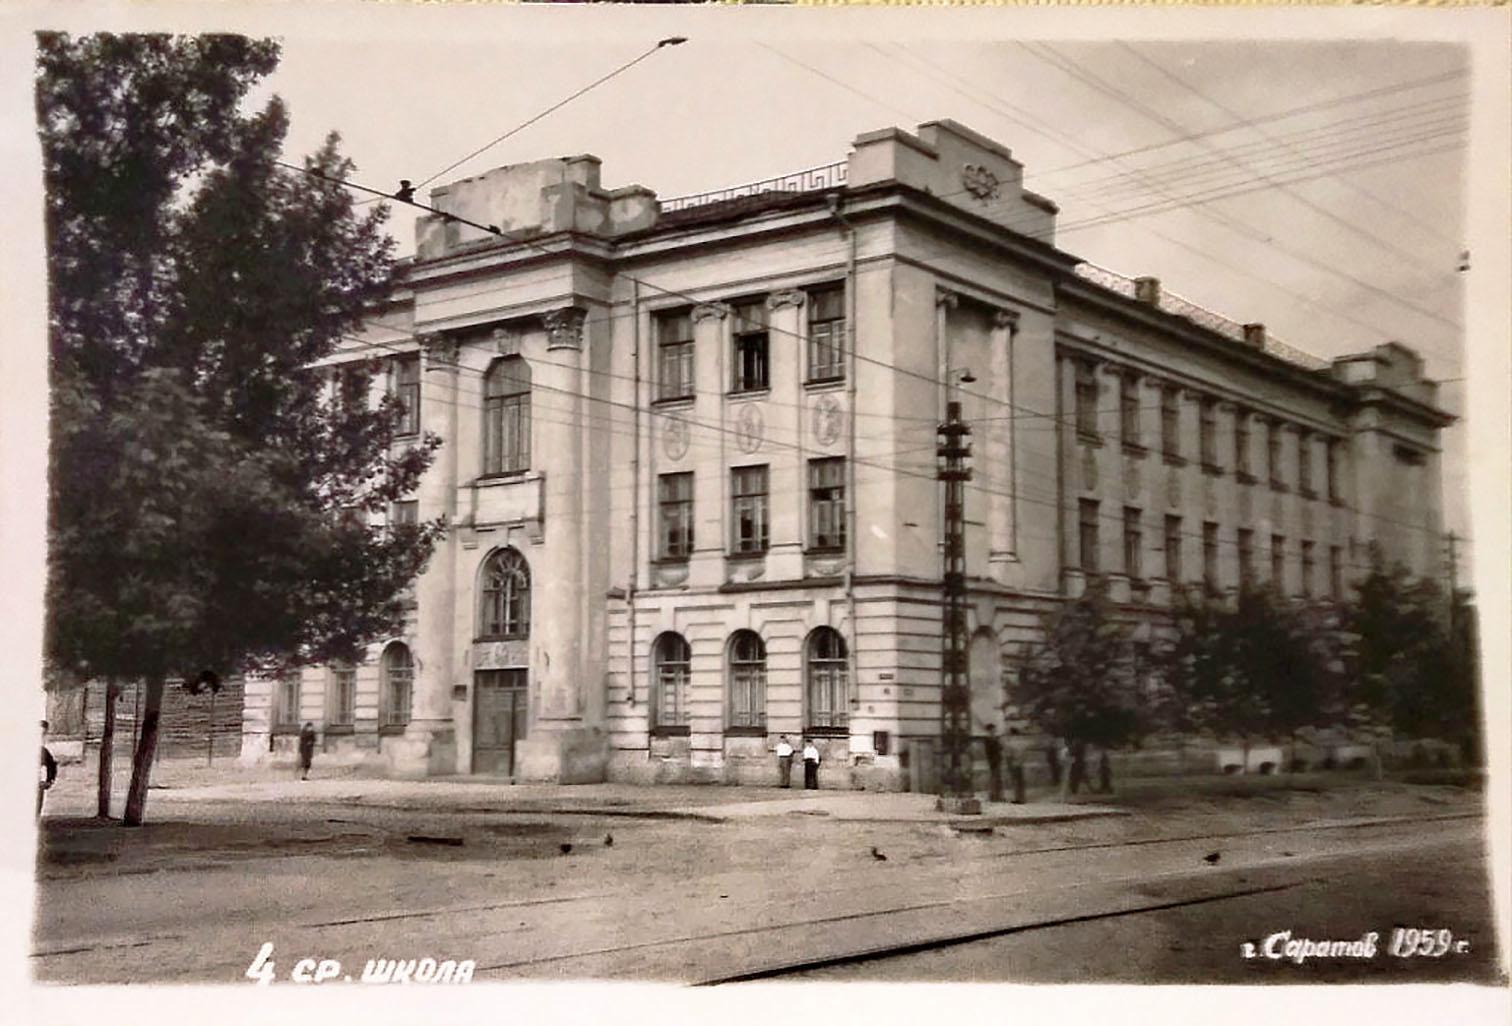 99-я школа на открытке 1959